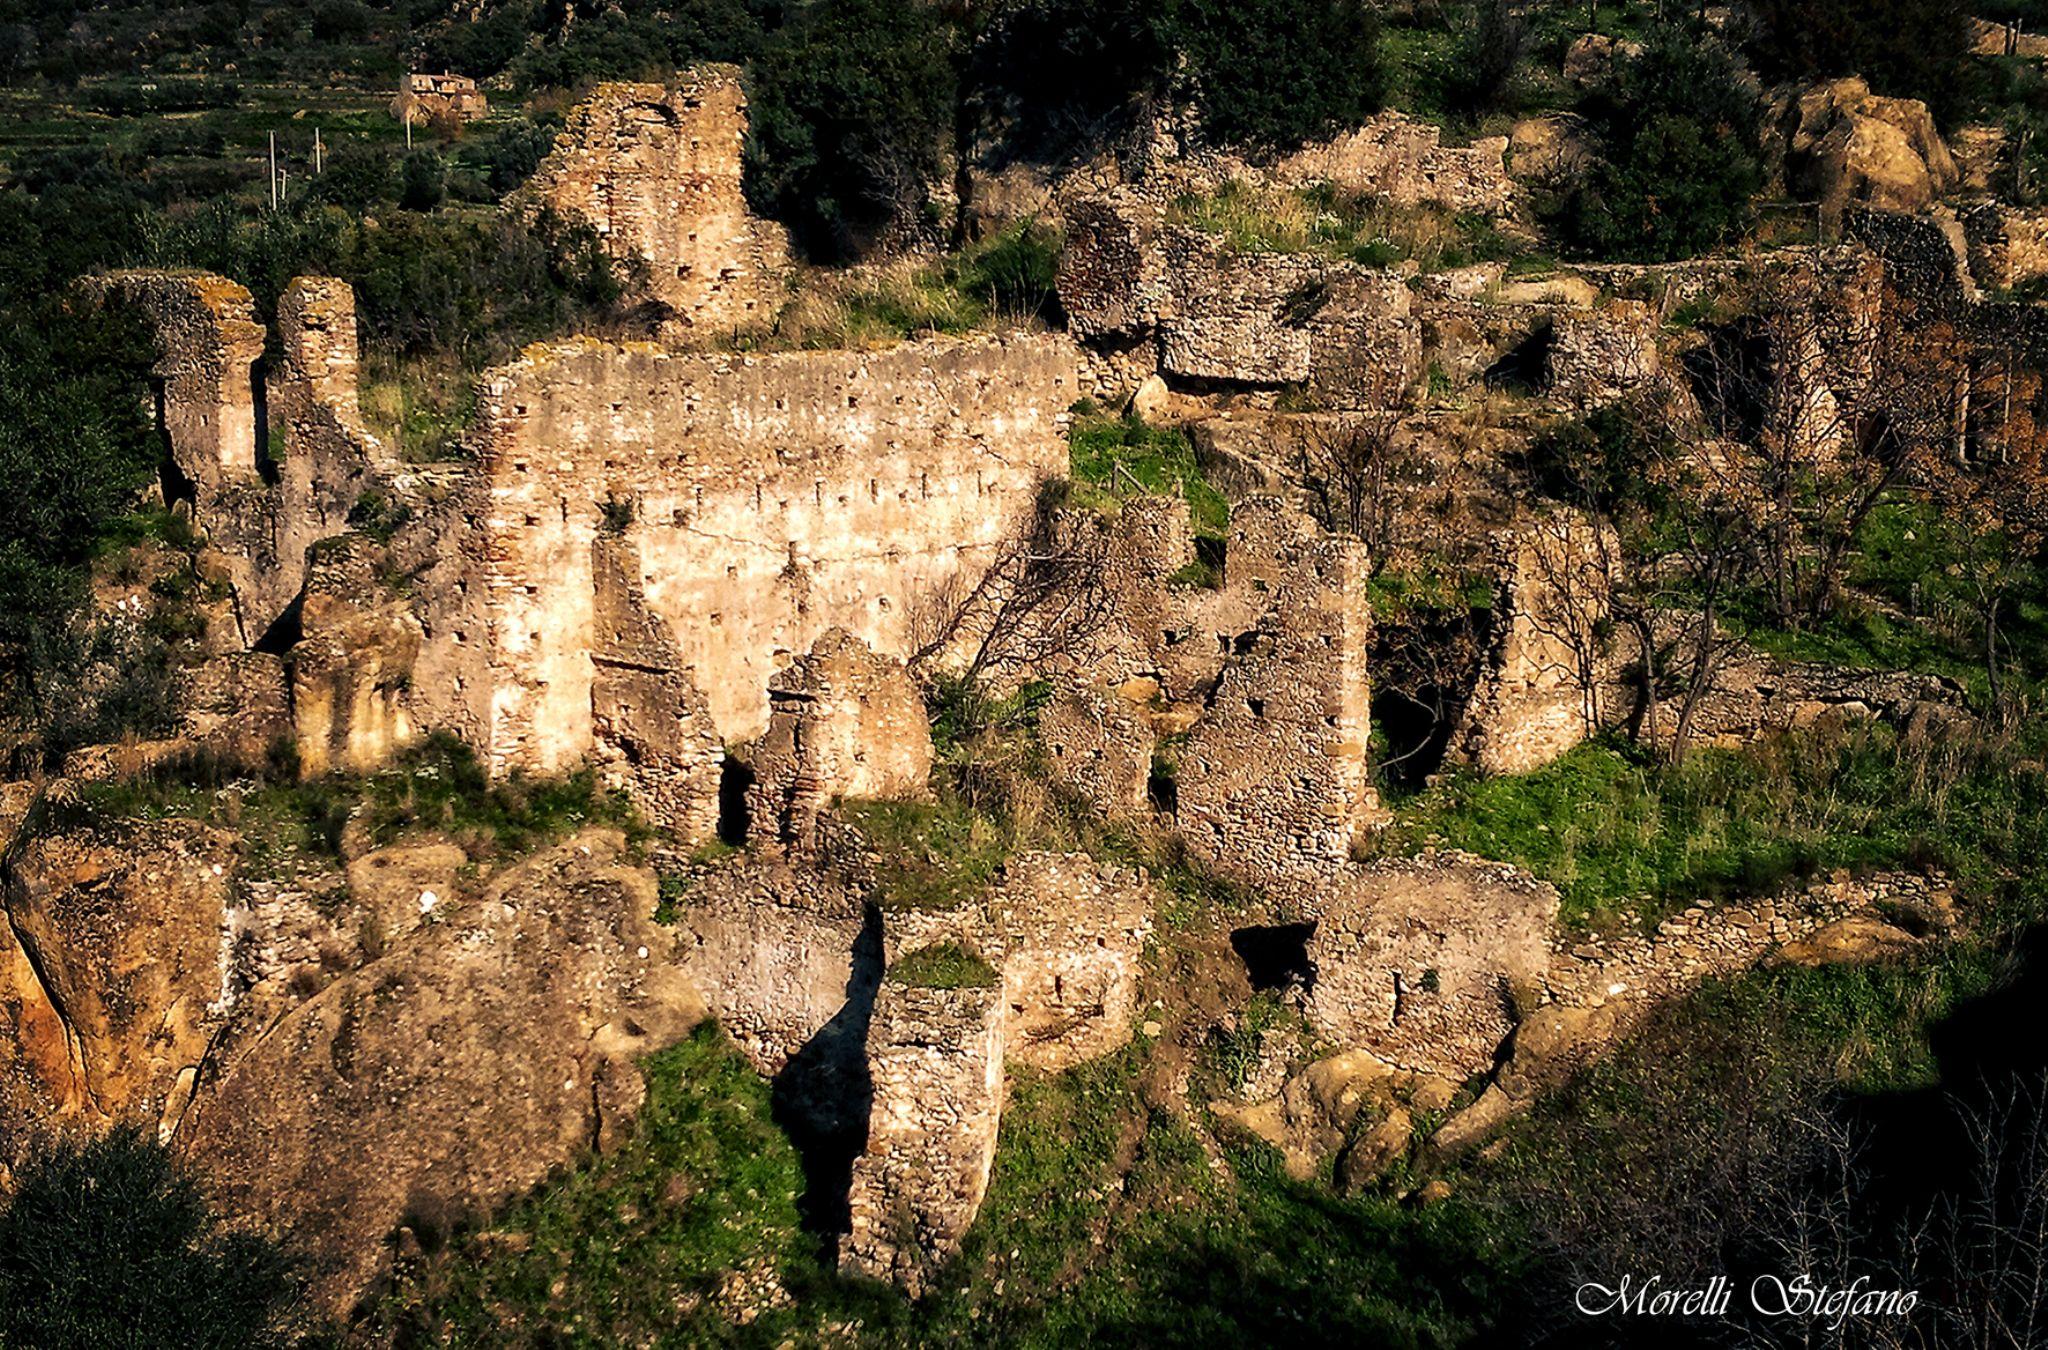 Antichi....sassi. by Stefano